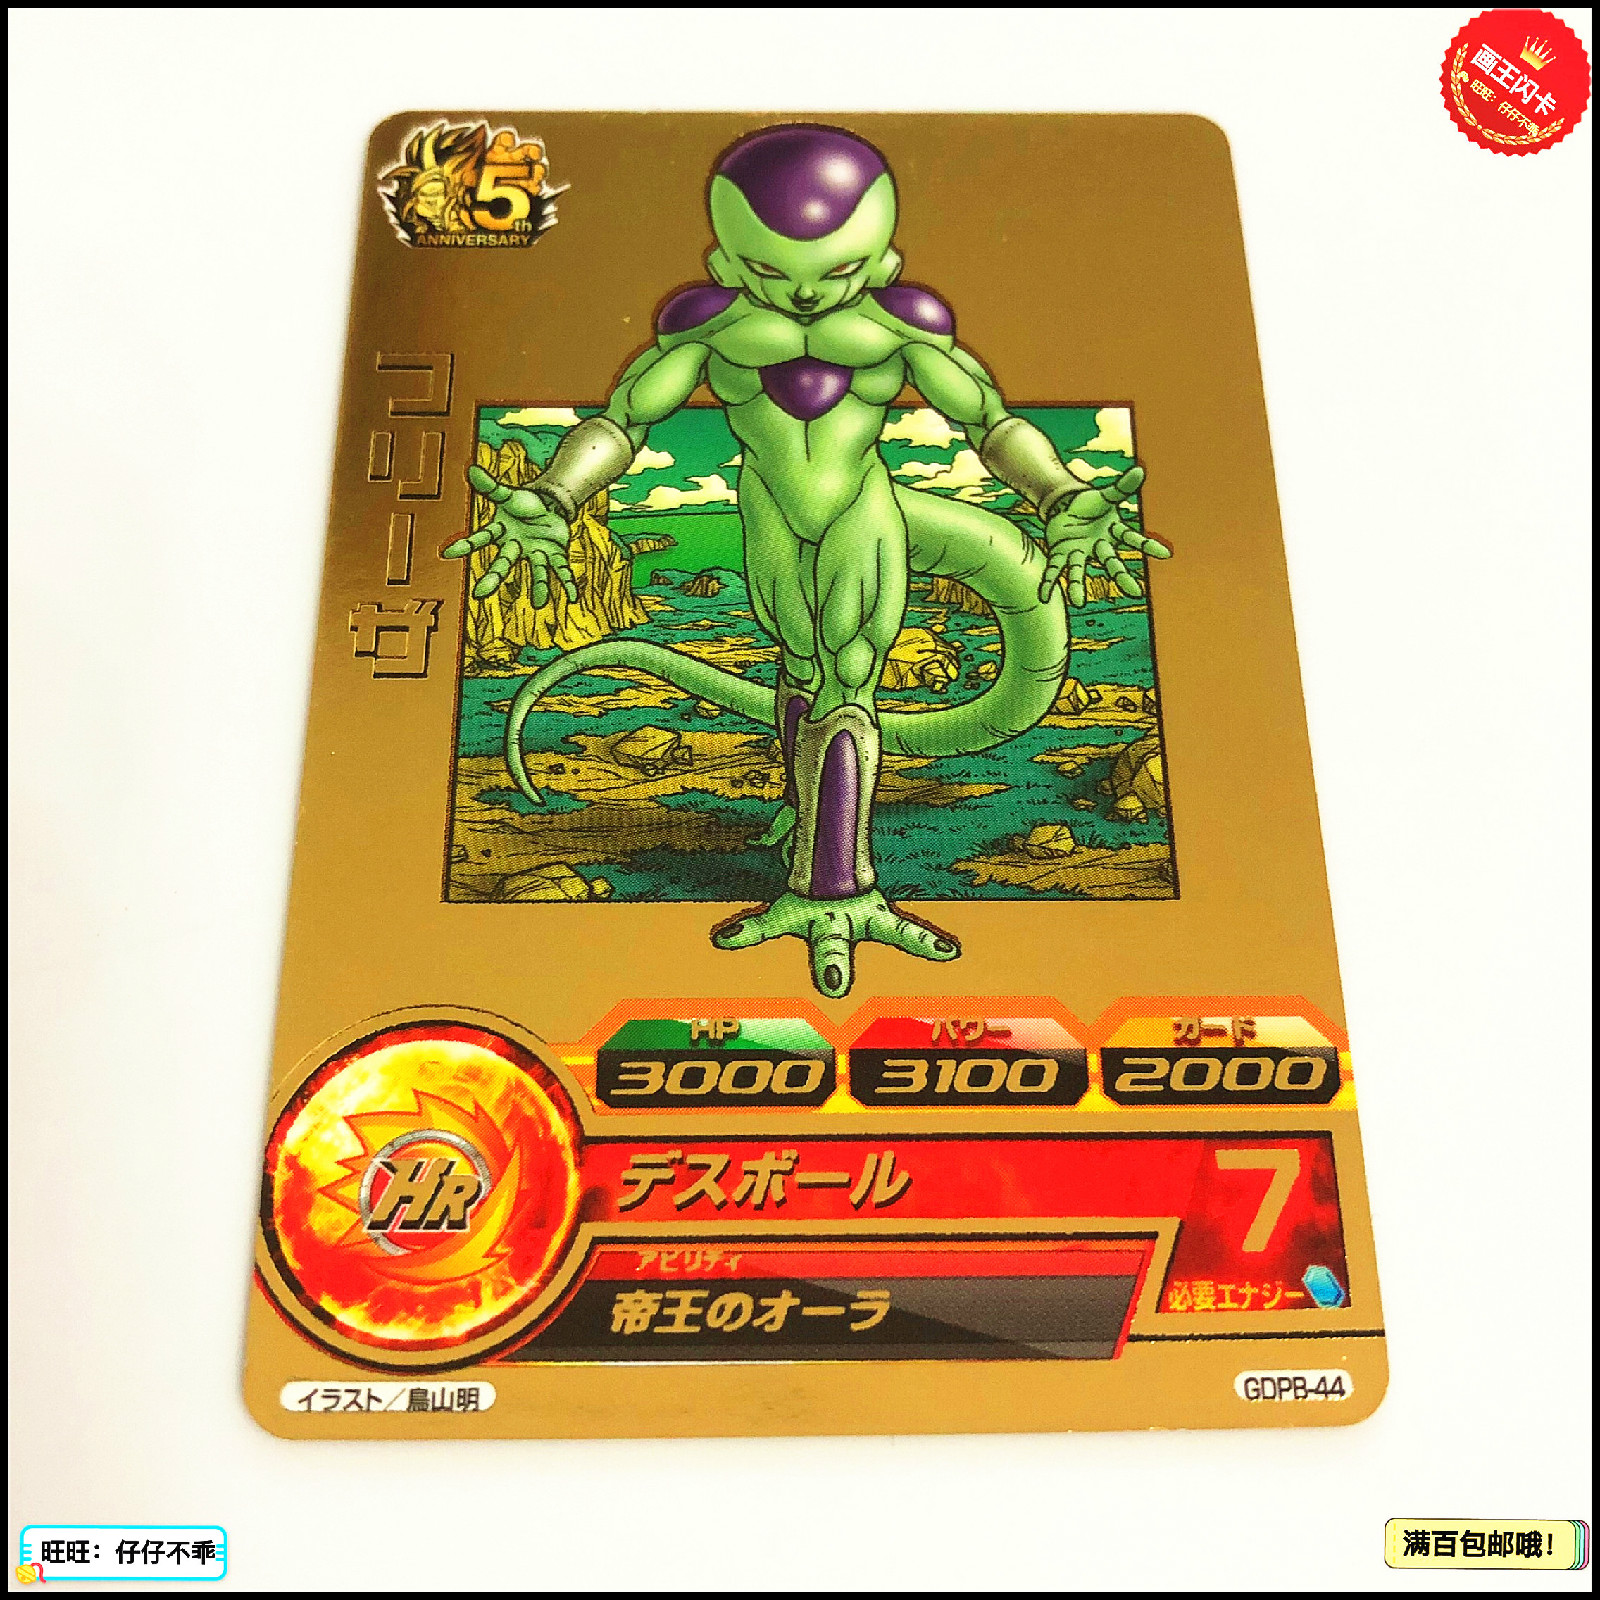 Japan Original Dragon Ball Hero Card GDPB-44 Goku Toys Hobbies Collectibles Game Collection Anime Cards